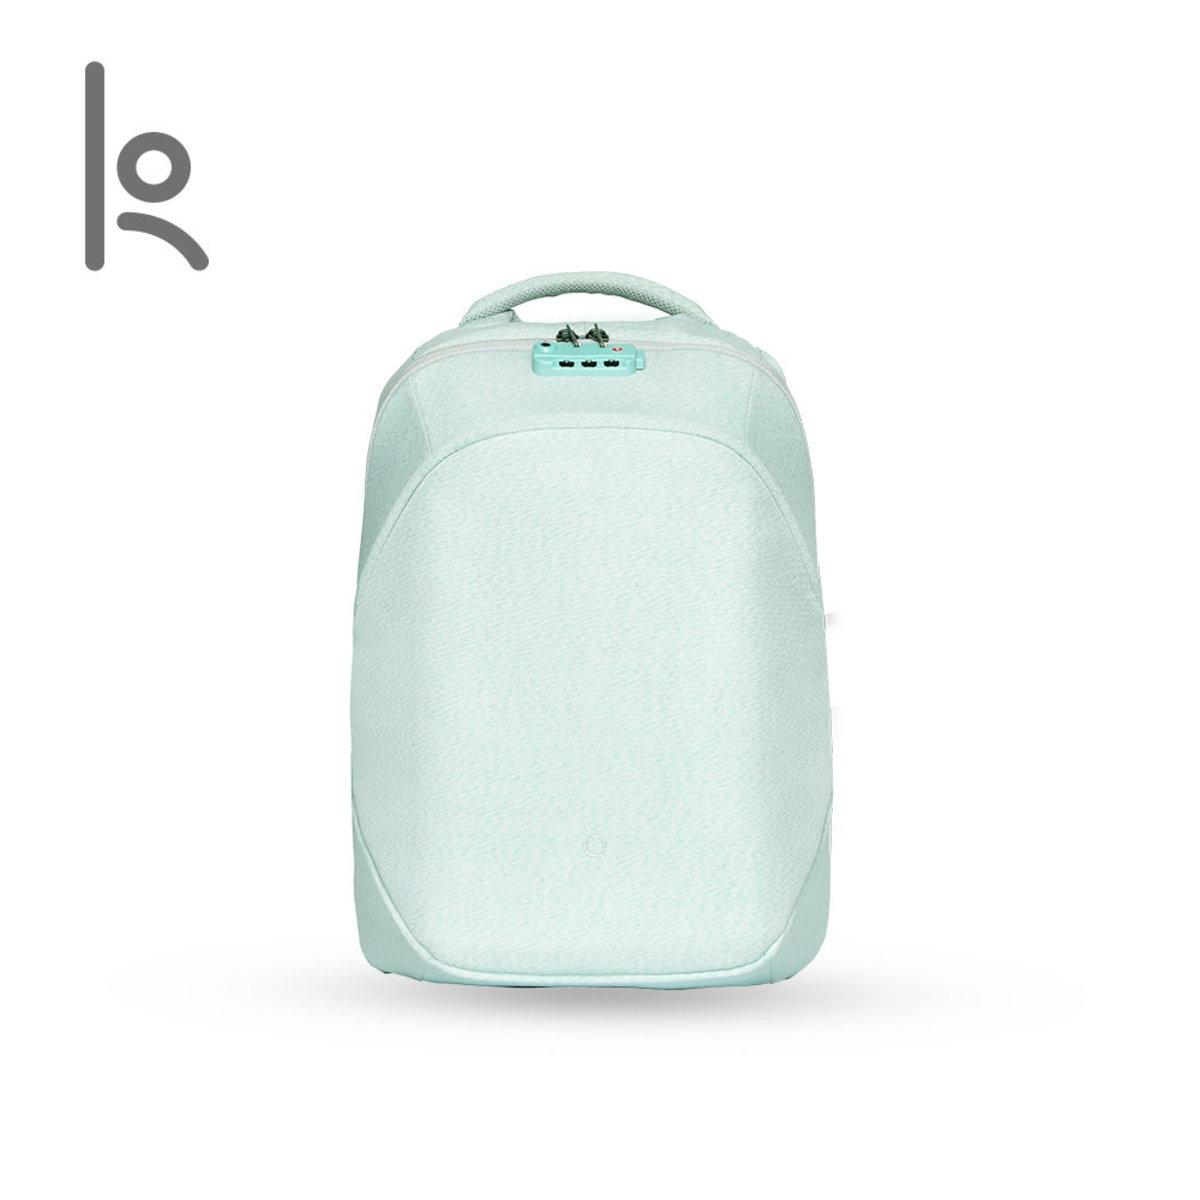 Korin Design ClickPack Joy-Mint Green